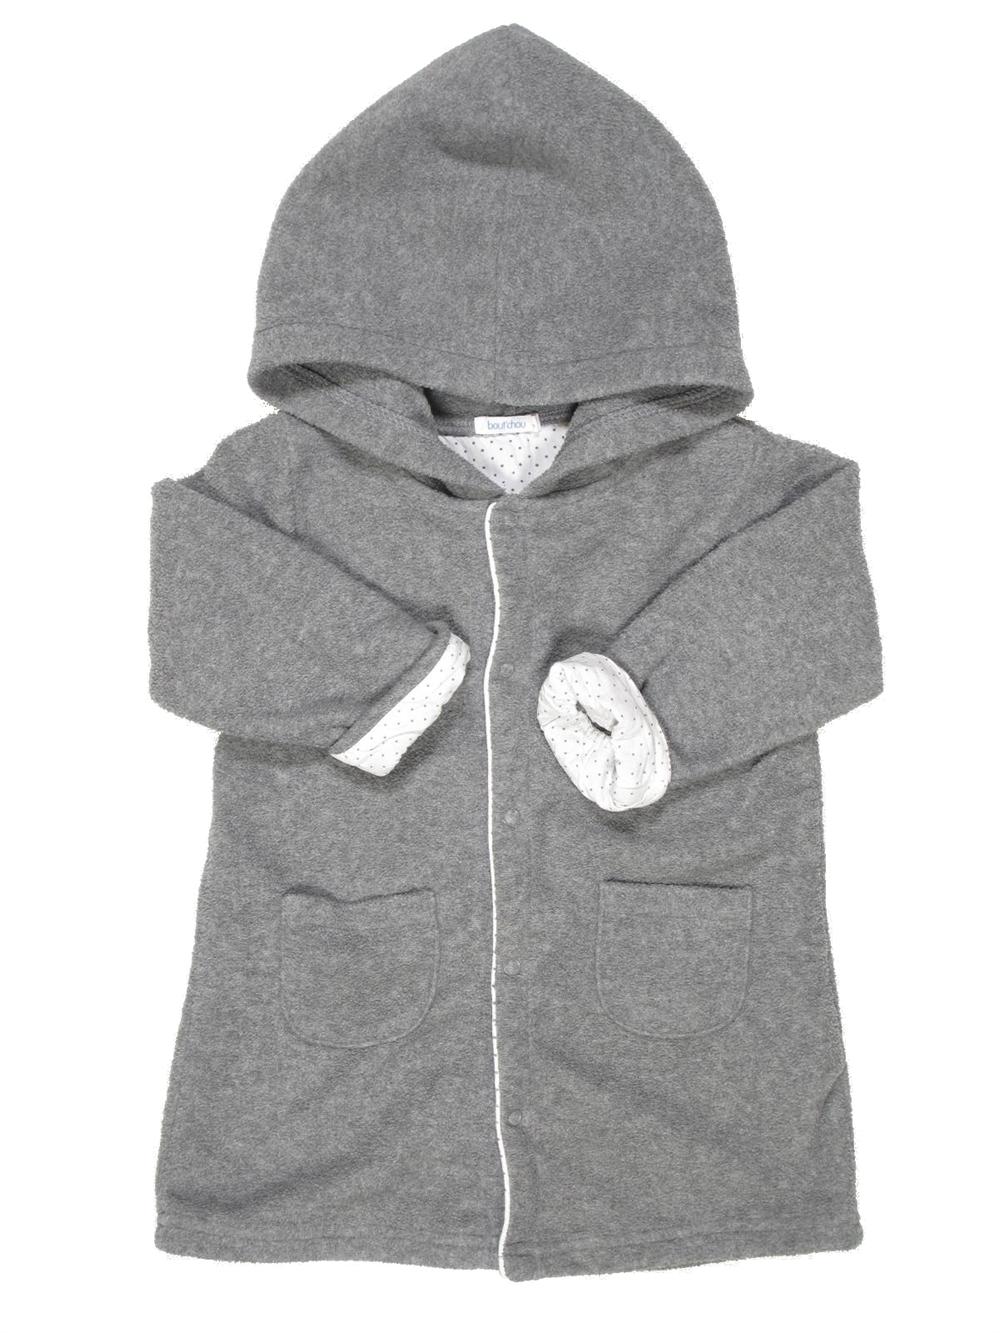 a71e160d6817f Robe de chambre gris BOUT'CHOU du 18 mois pour Fille ou Garcon - 493892